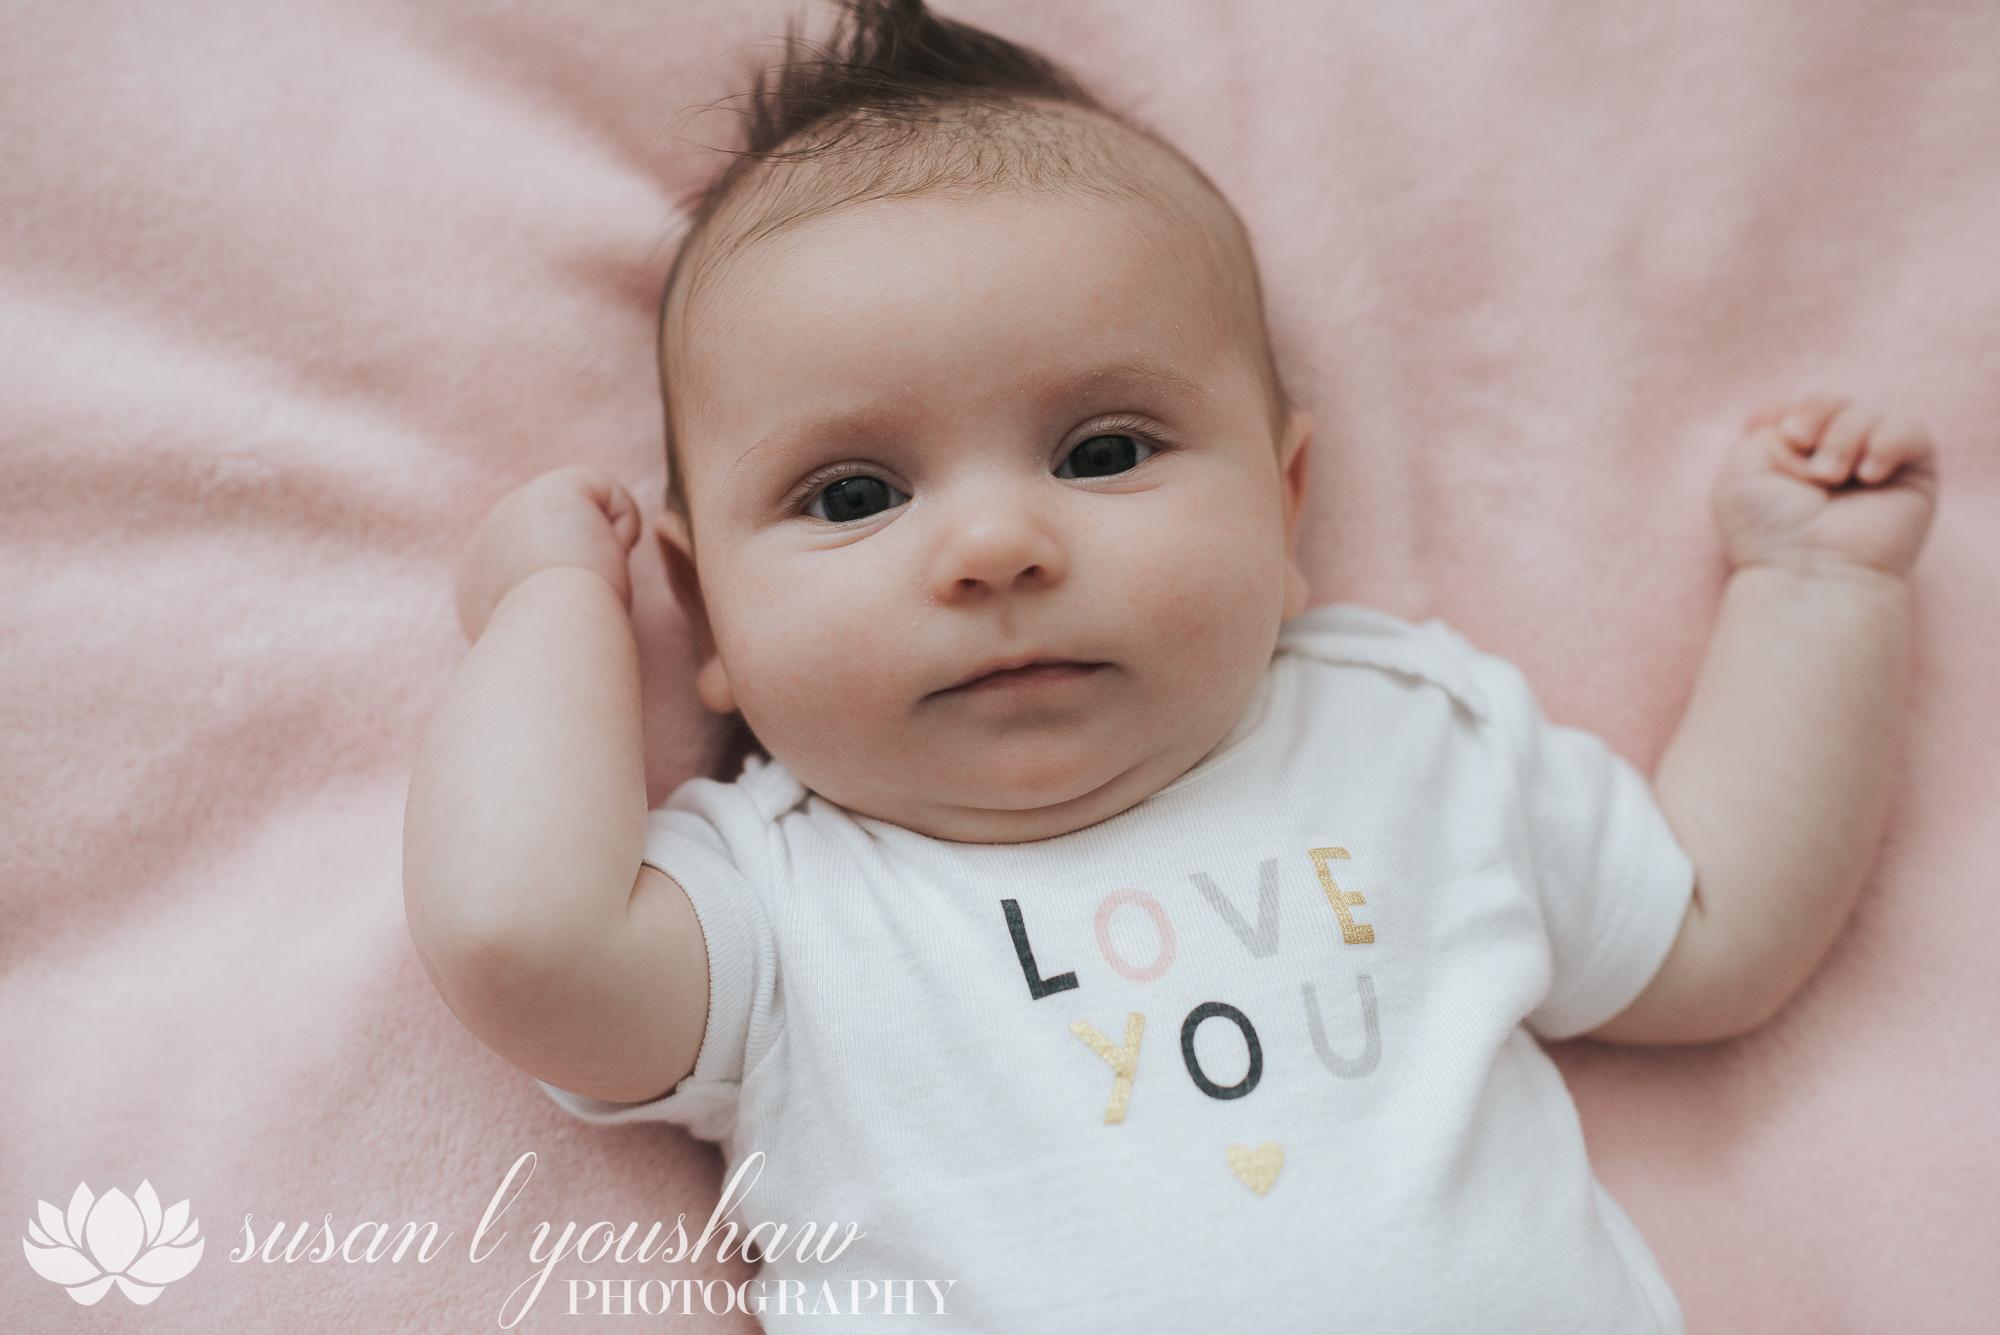 BLOG The Deao Family 06-29-2018 SLY Photography LLC-25.jpg